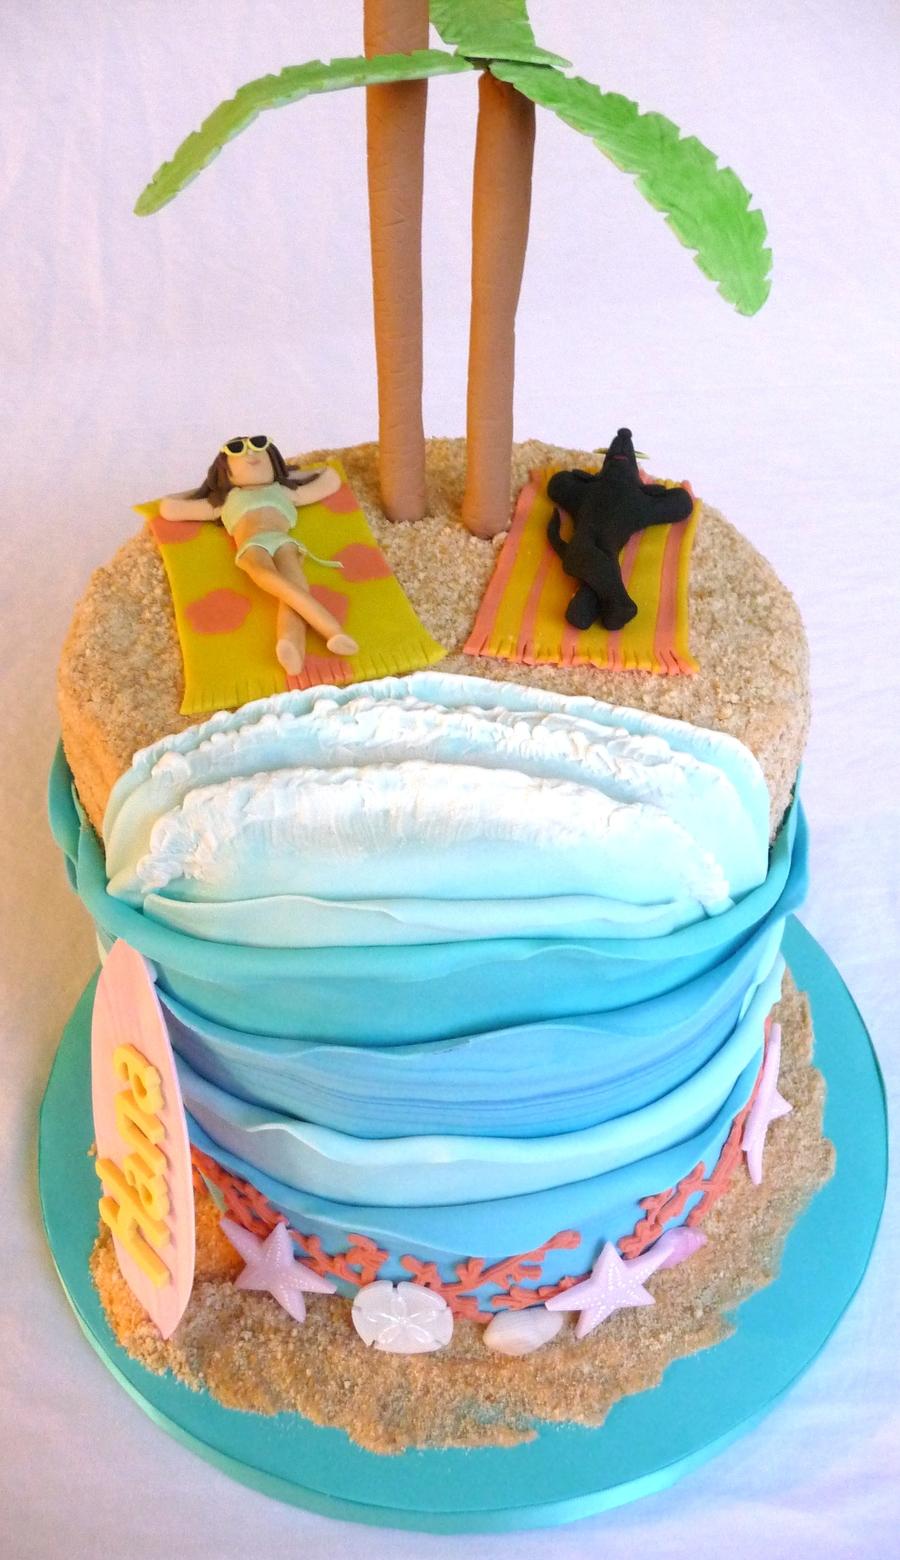 Celebrate Summer Birthdays with Birthdayexpress.com |Beach Themed Birthday Cakes